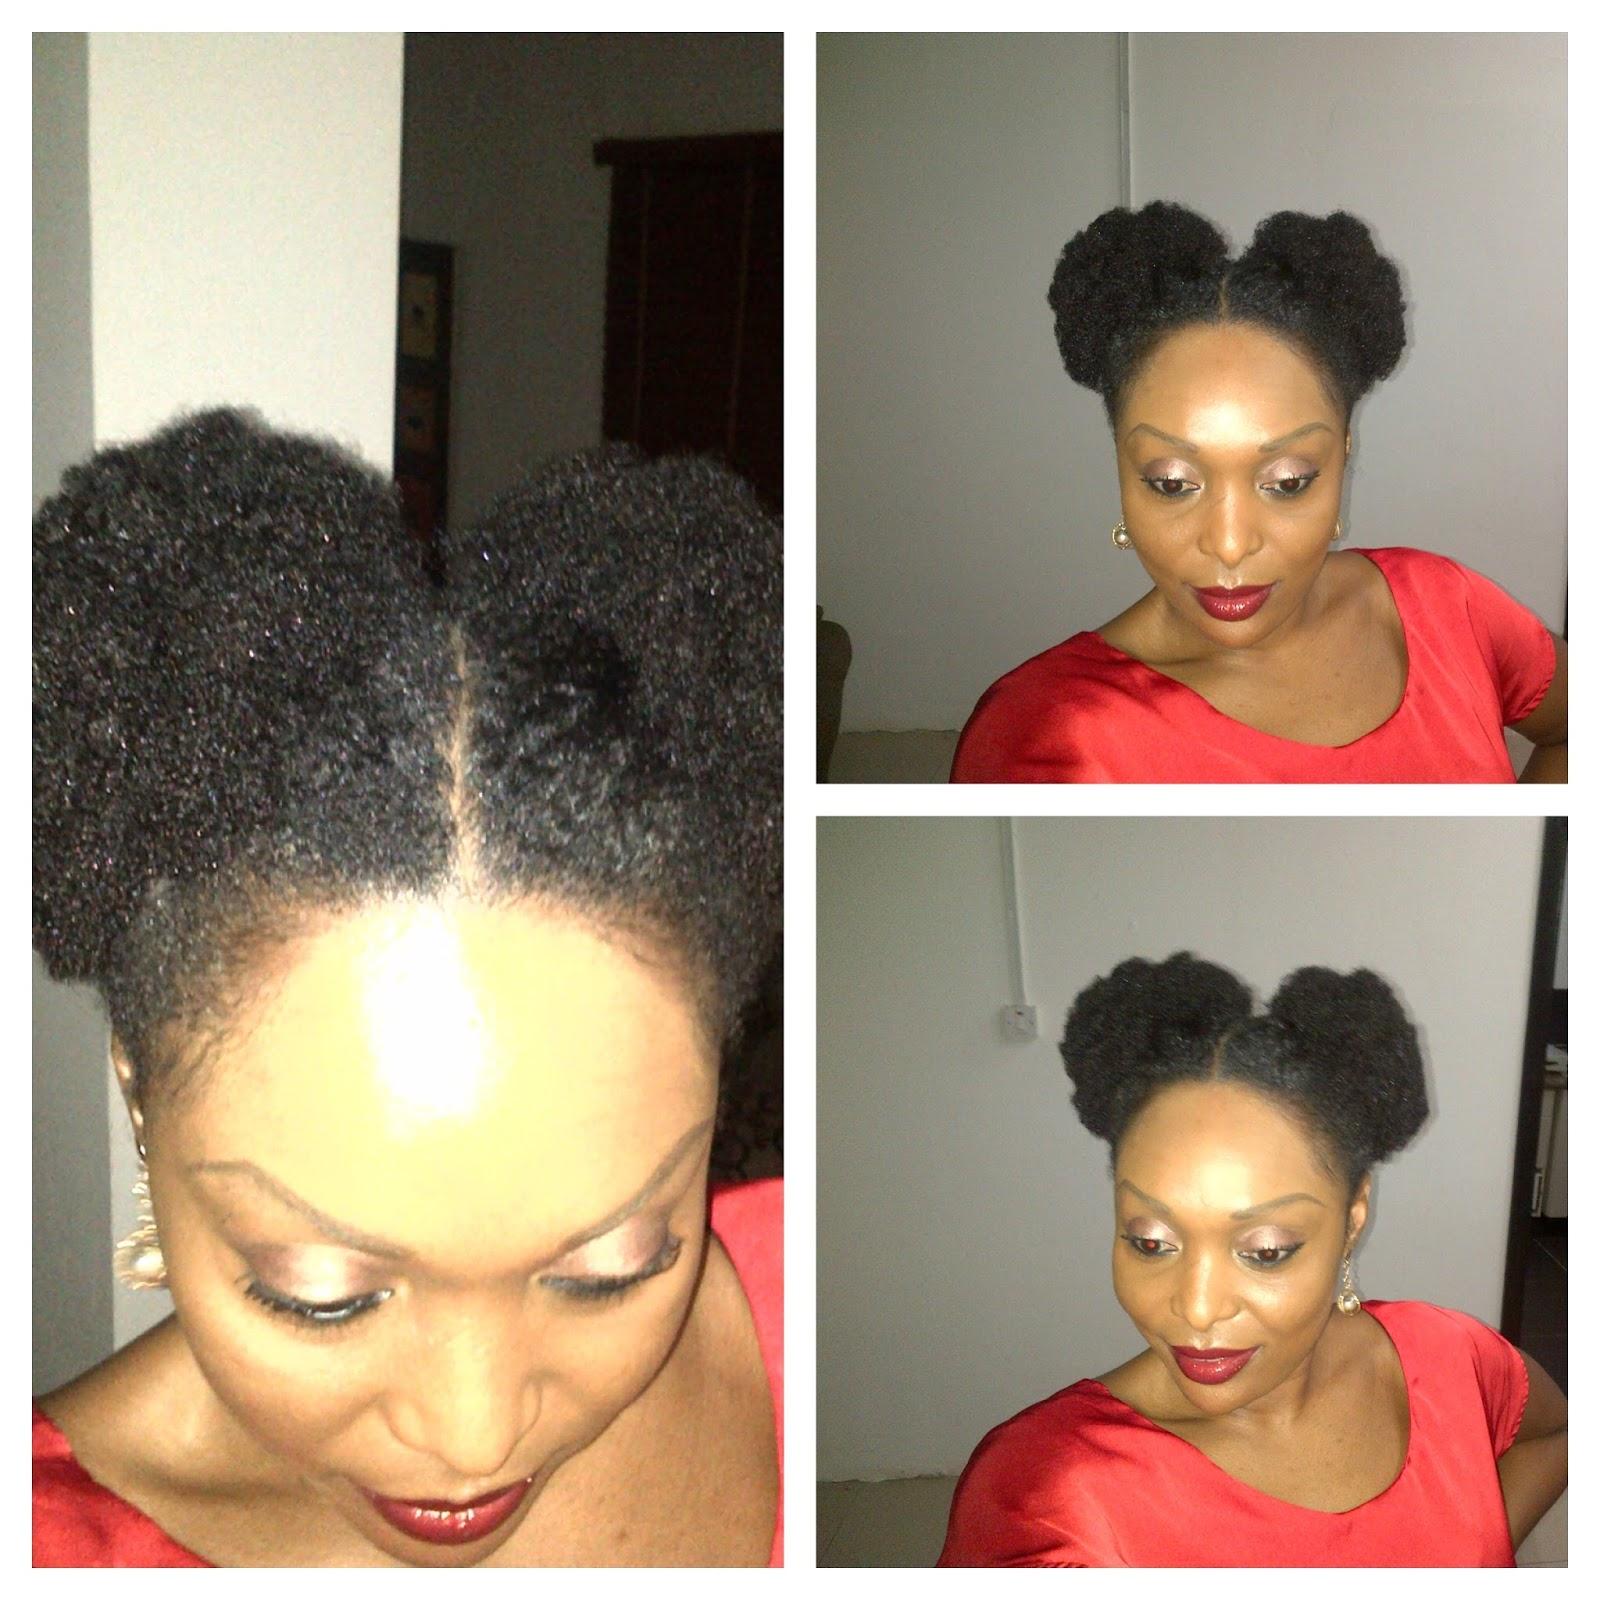 Rocking some Afro Puffs! - KLs Naturals